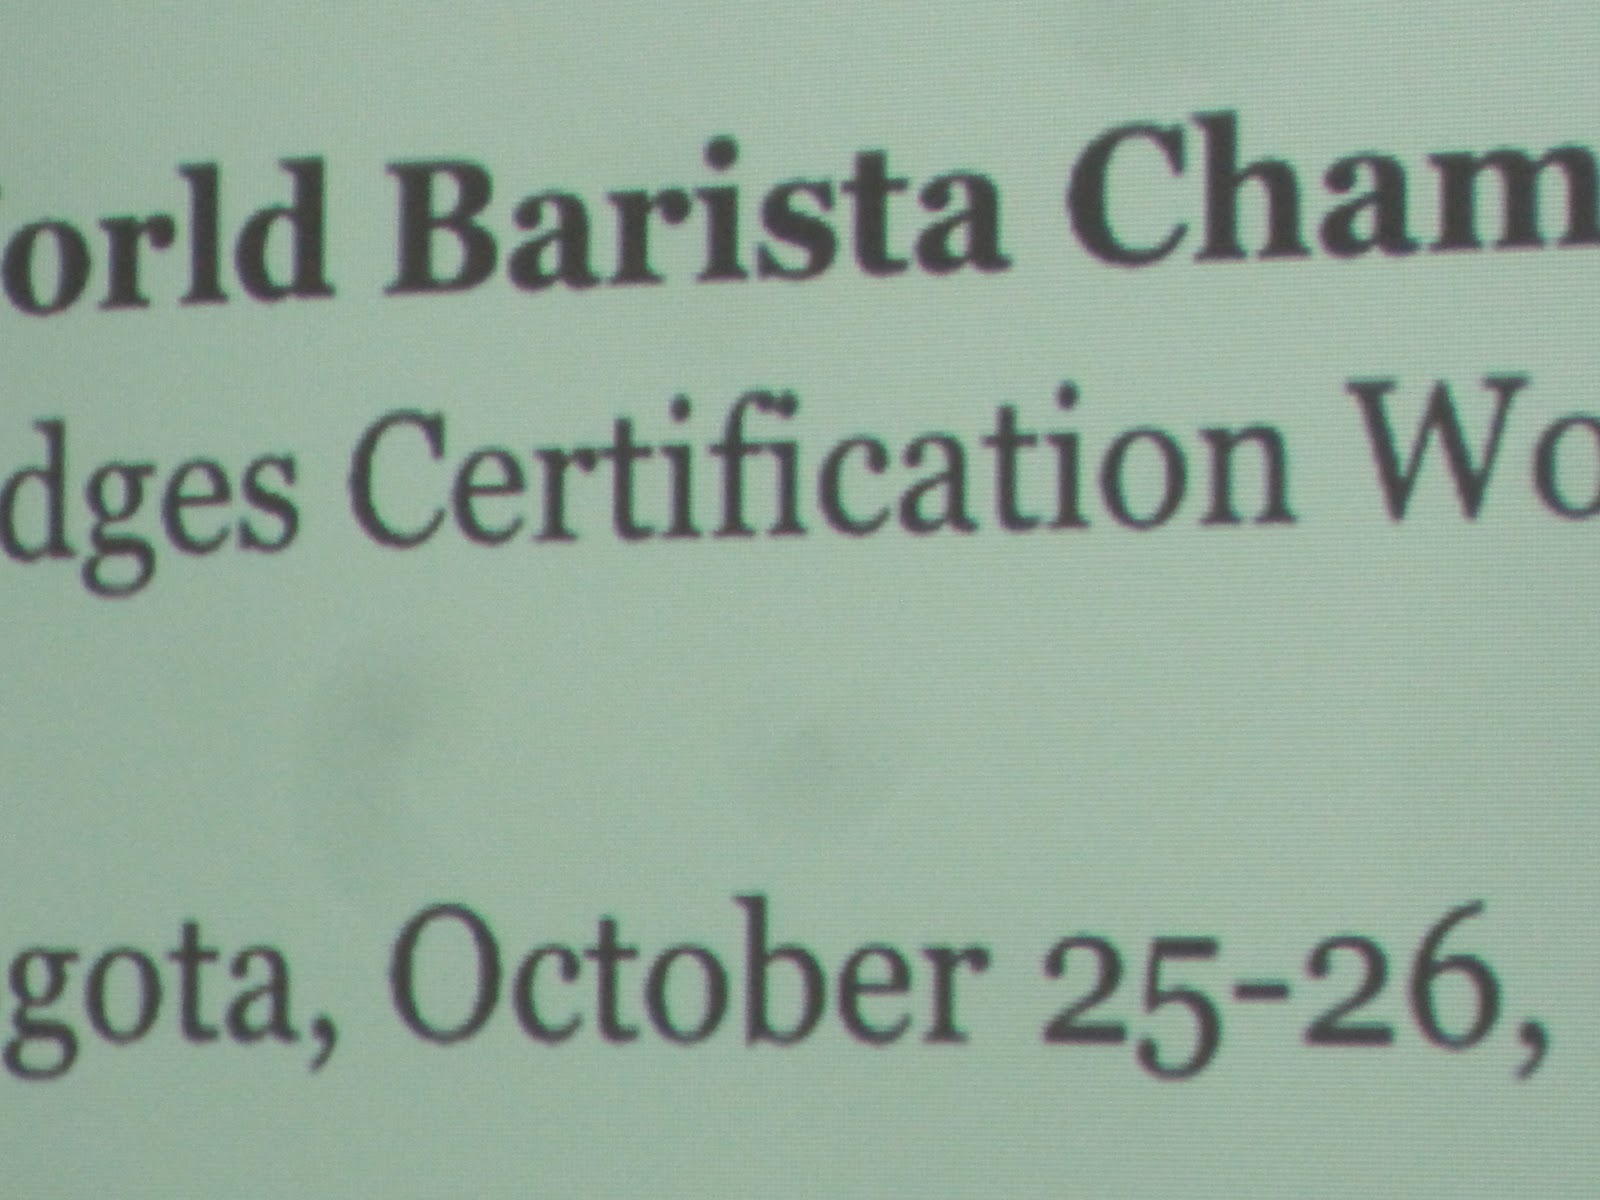 Jay\'s Strange Blog: WBC Judges Certification